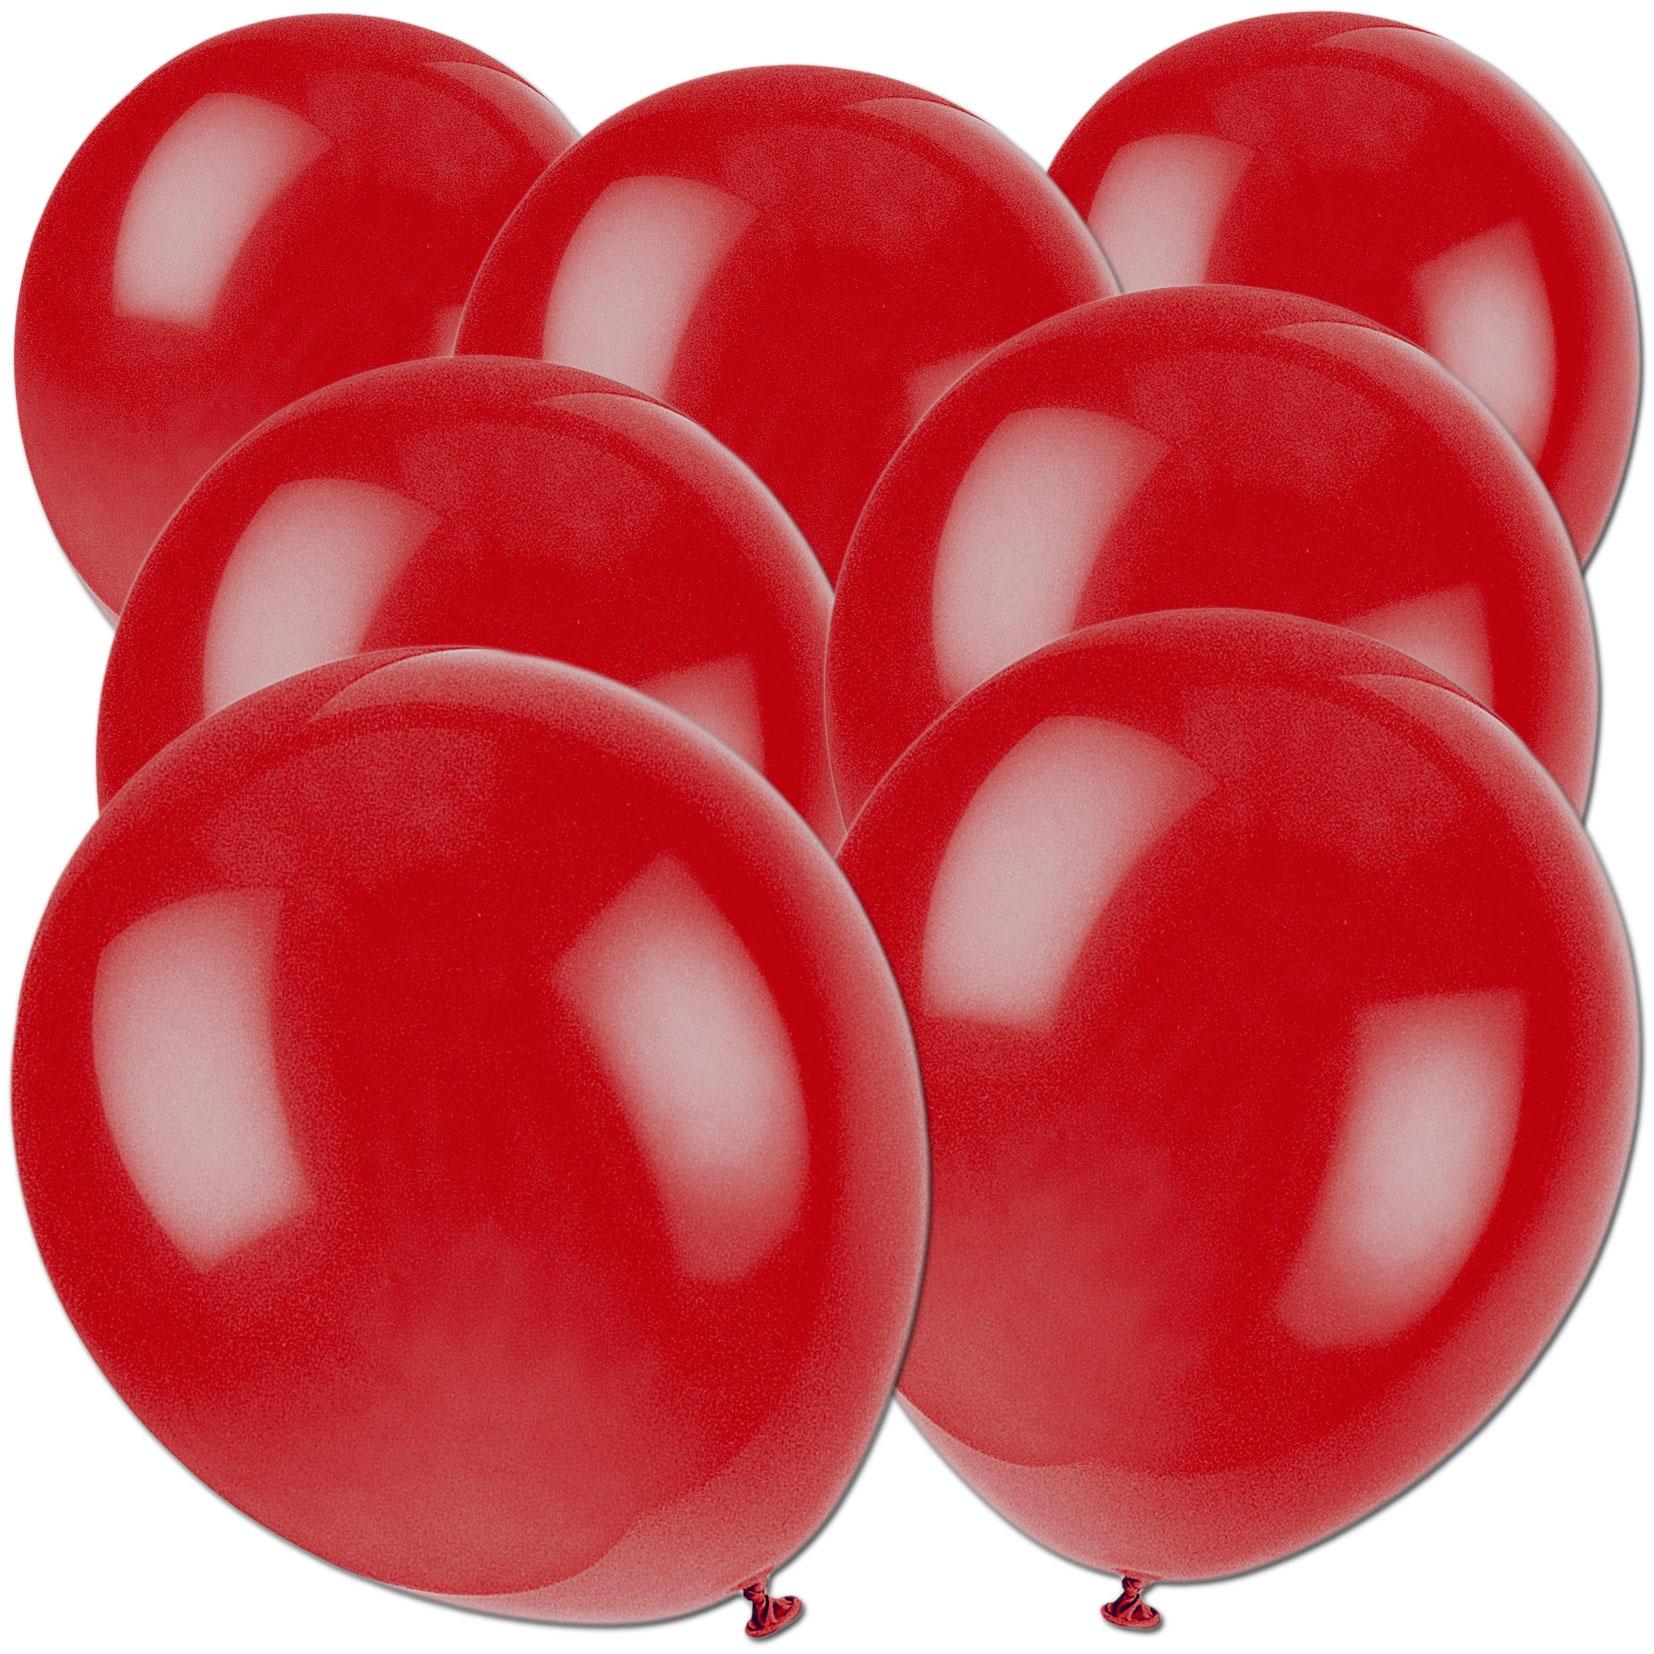 Luftballons dunkelrot, 50 St., 30cm, einfarbige Ballons, kräftiges Rot